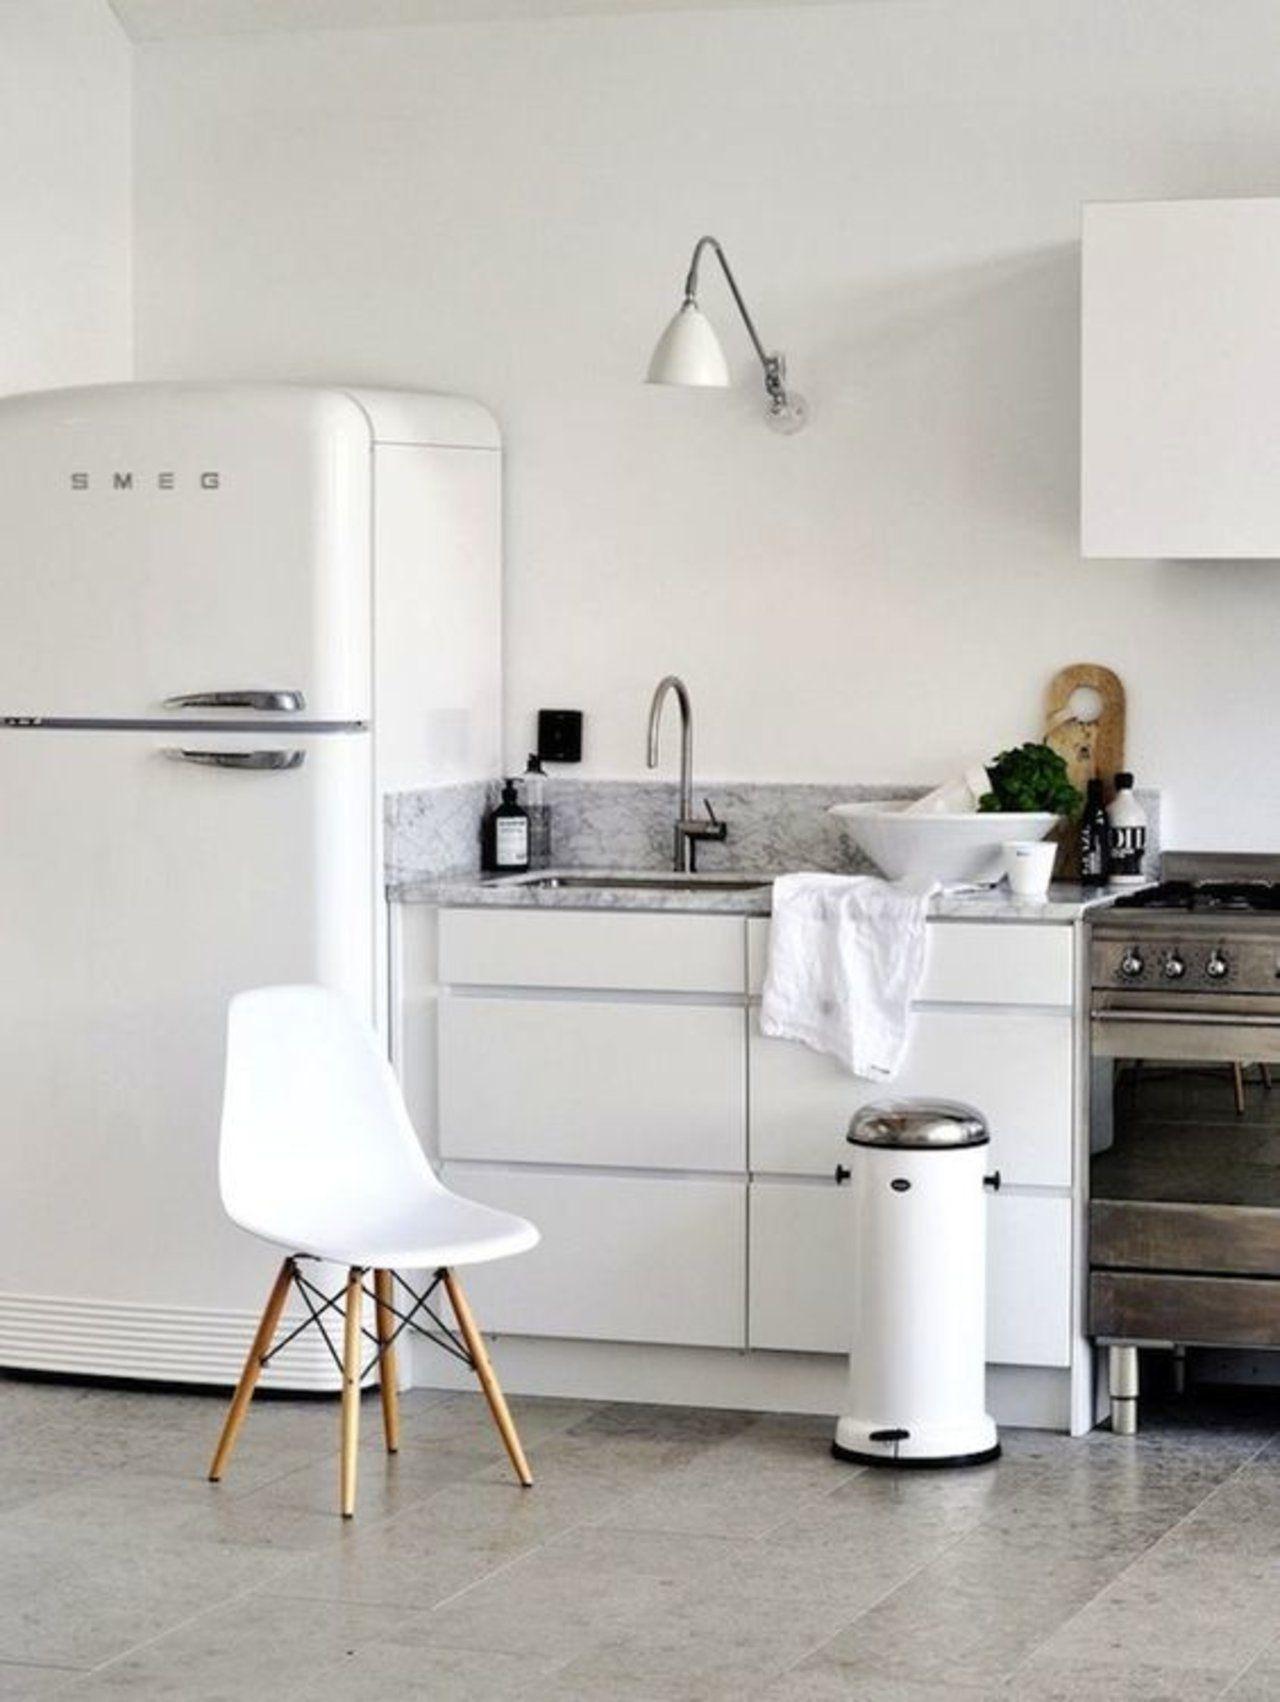 8 rooms that prove smeg fridges are the key to a fabulously retro